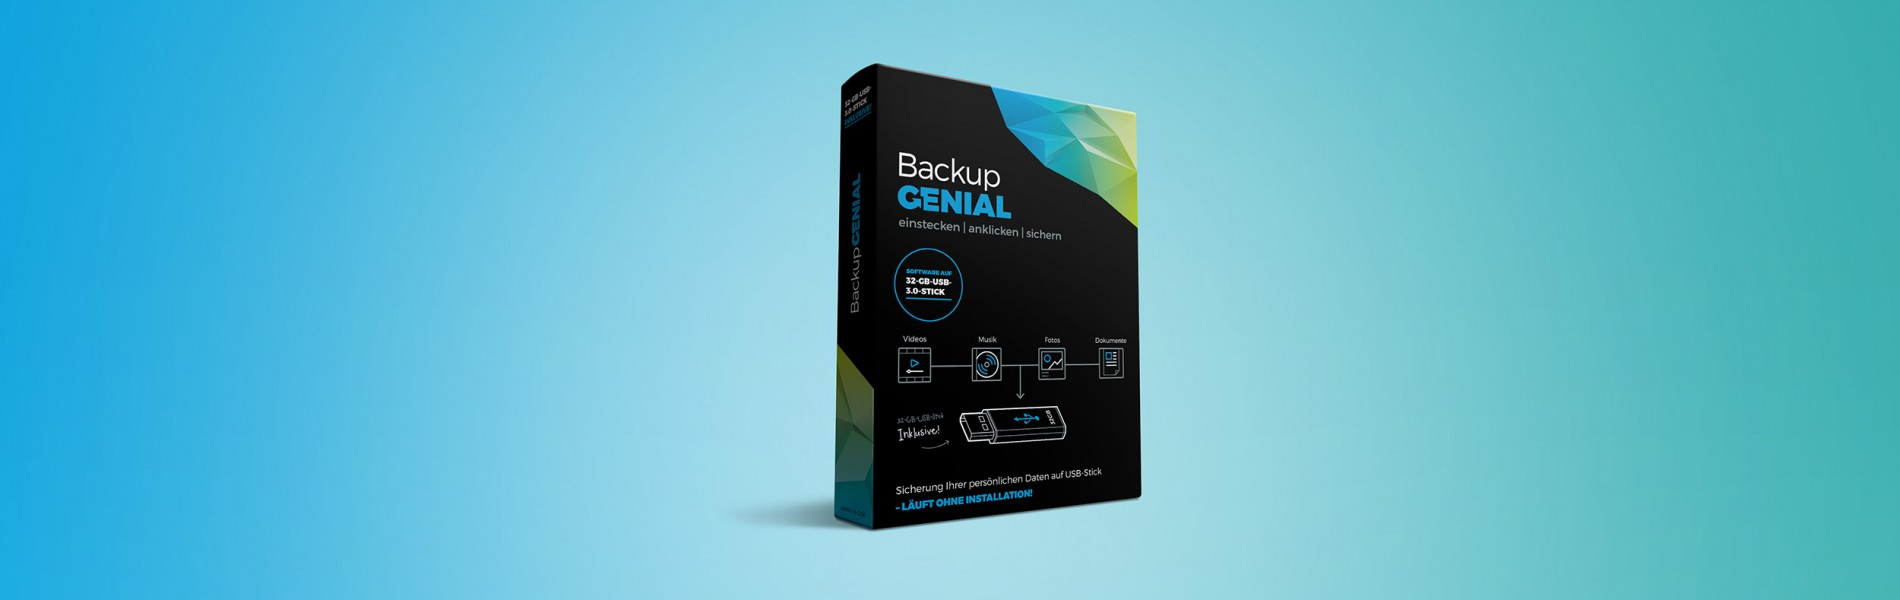 Backup Genial